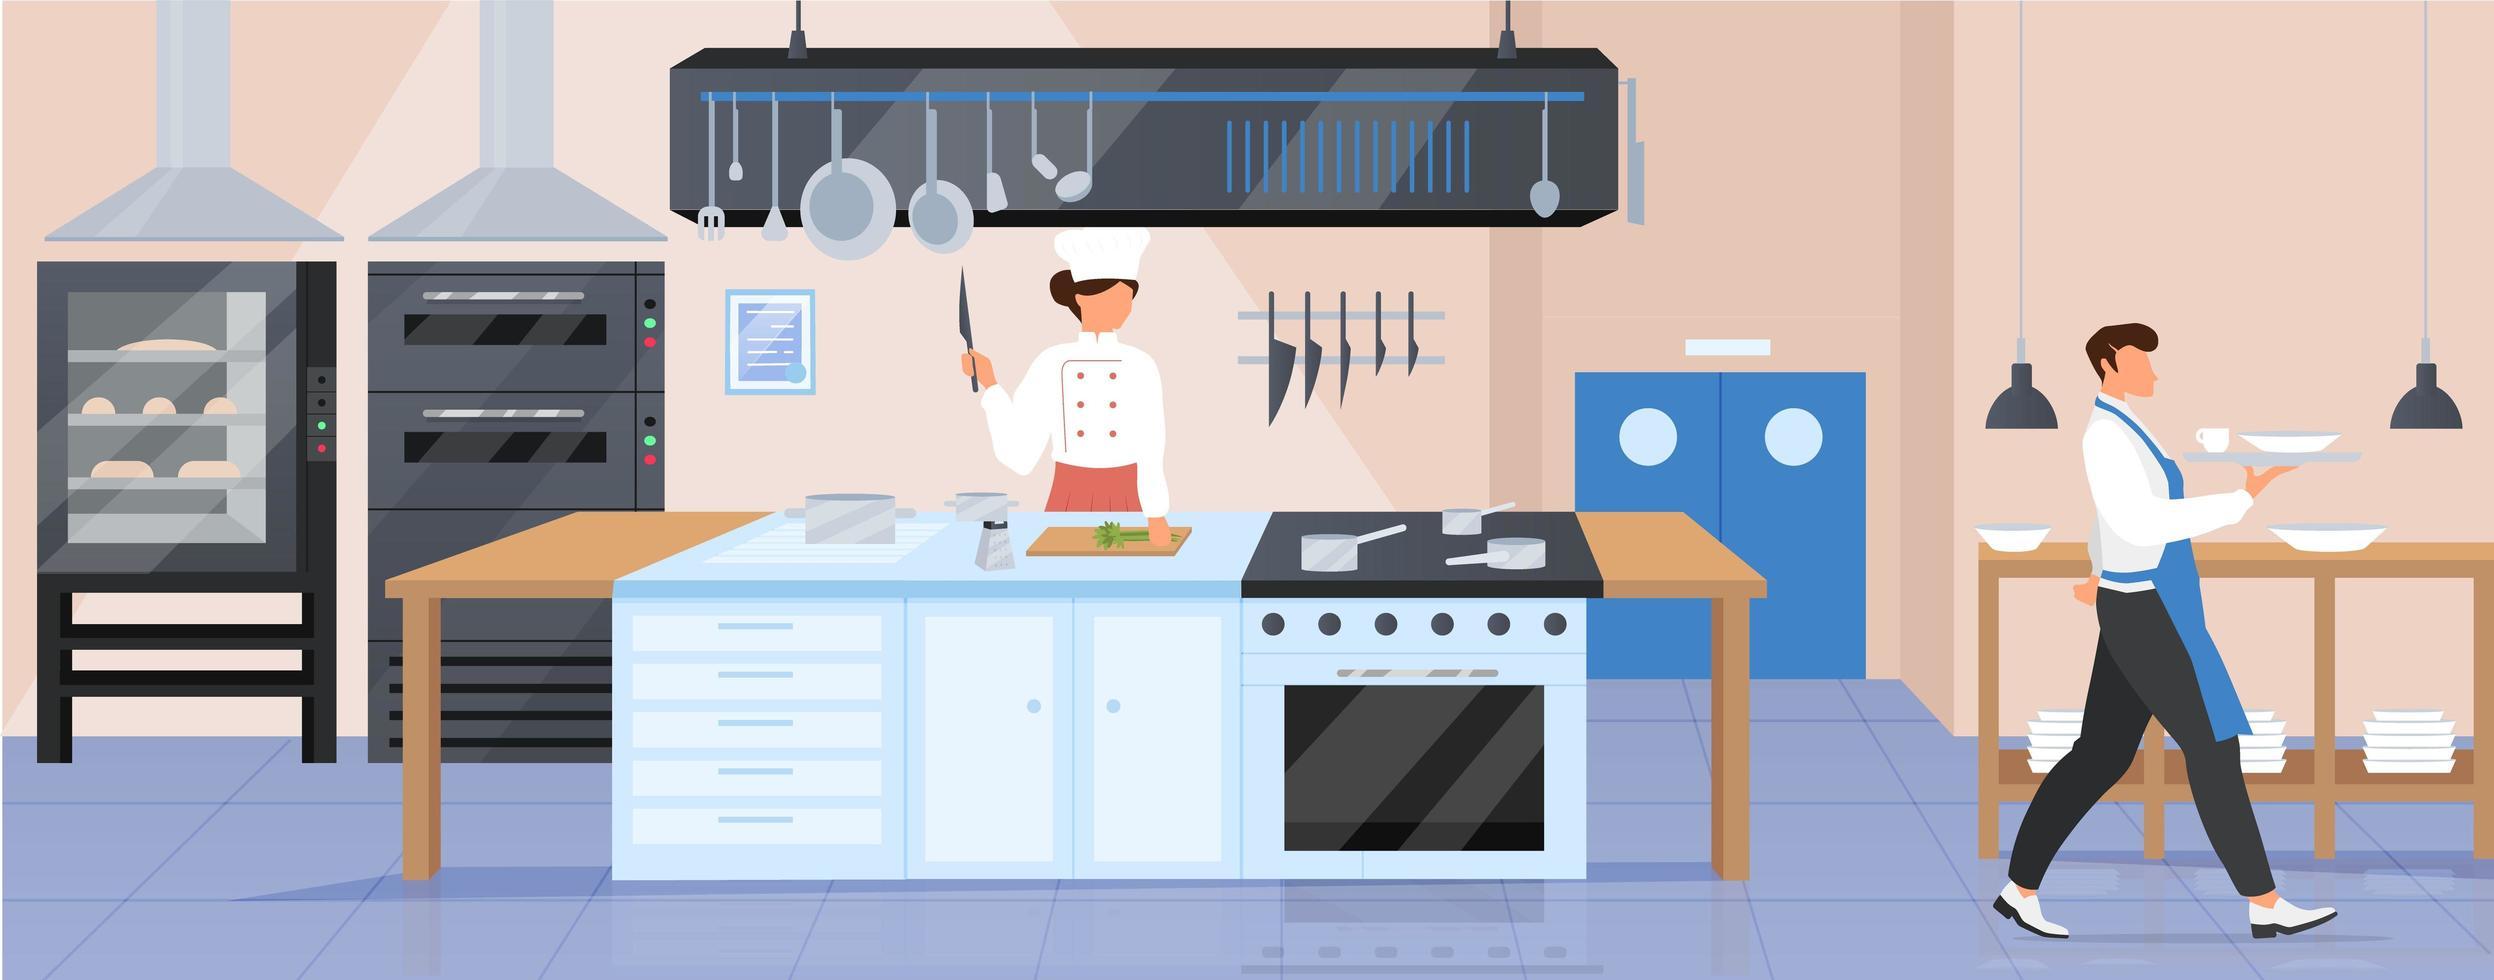 Restaurant kitchen flat color vector illustration